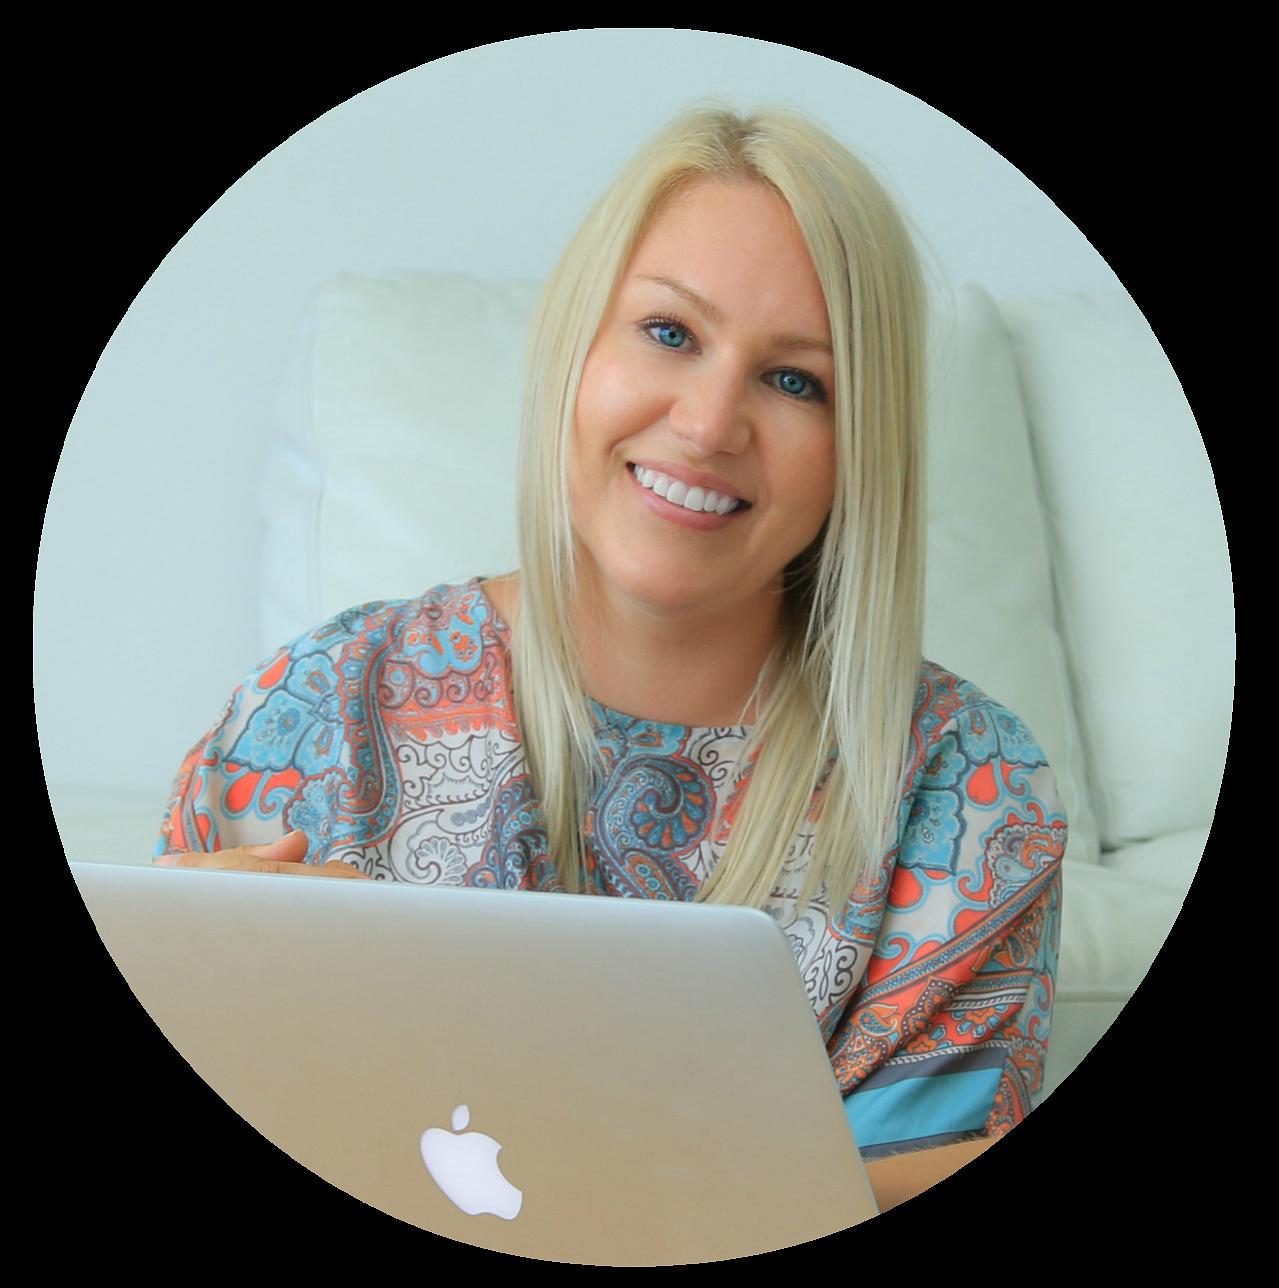 Kylie Malcolm | Fairy Godmother to Health & Wellness Entrepreneurs